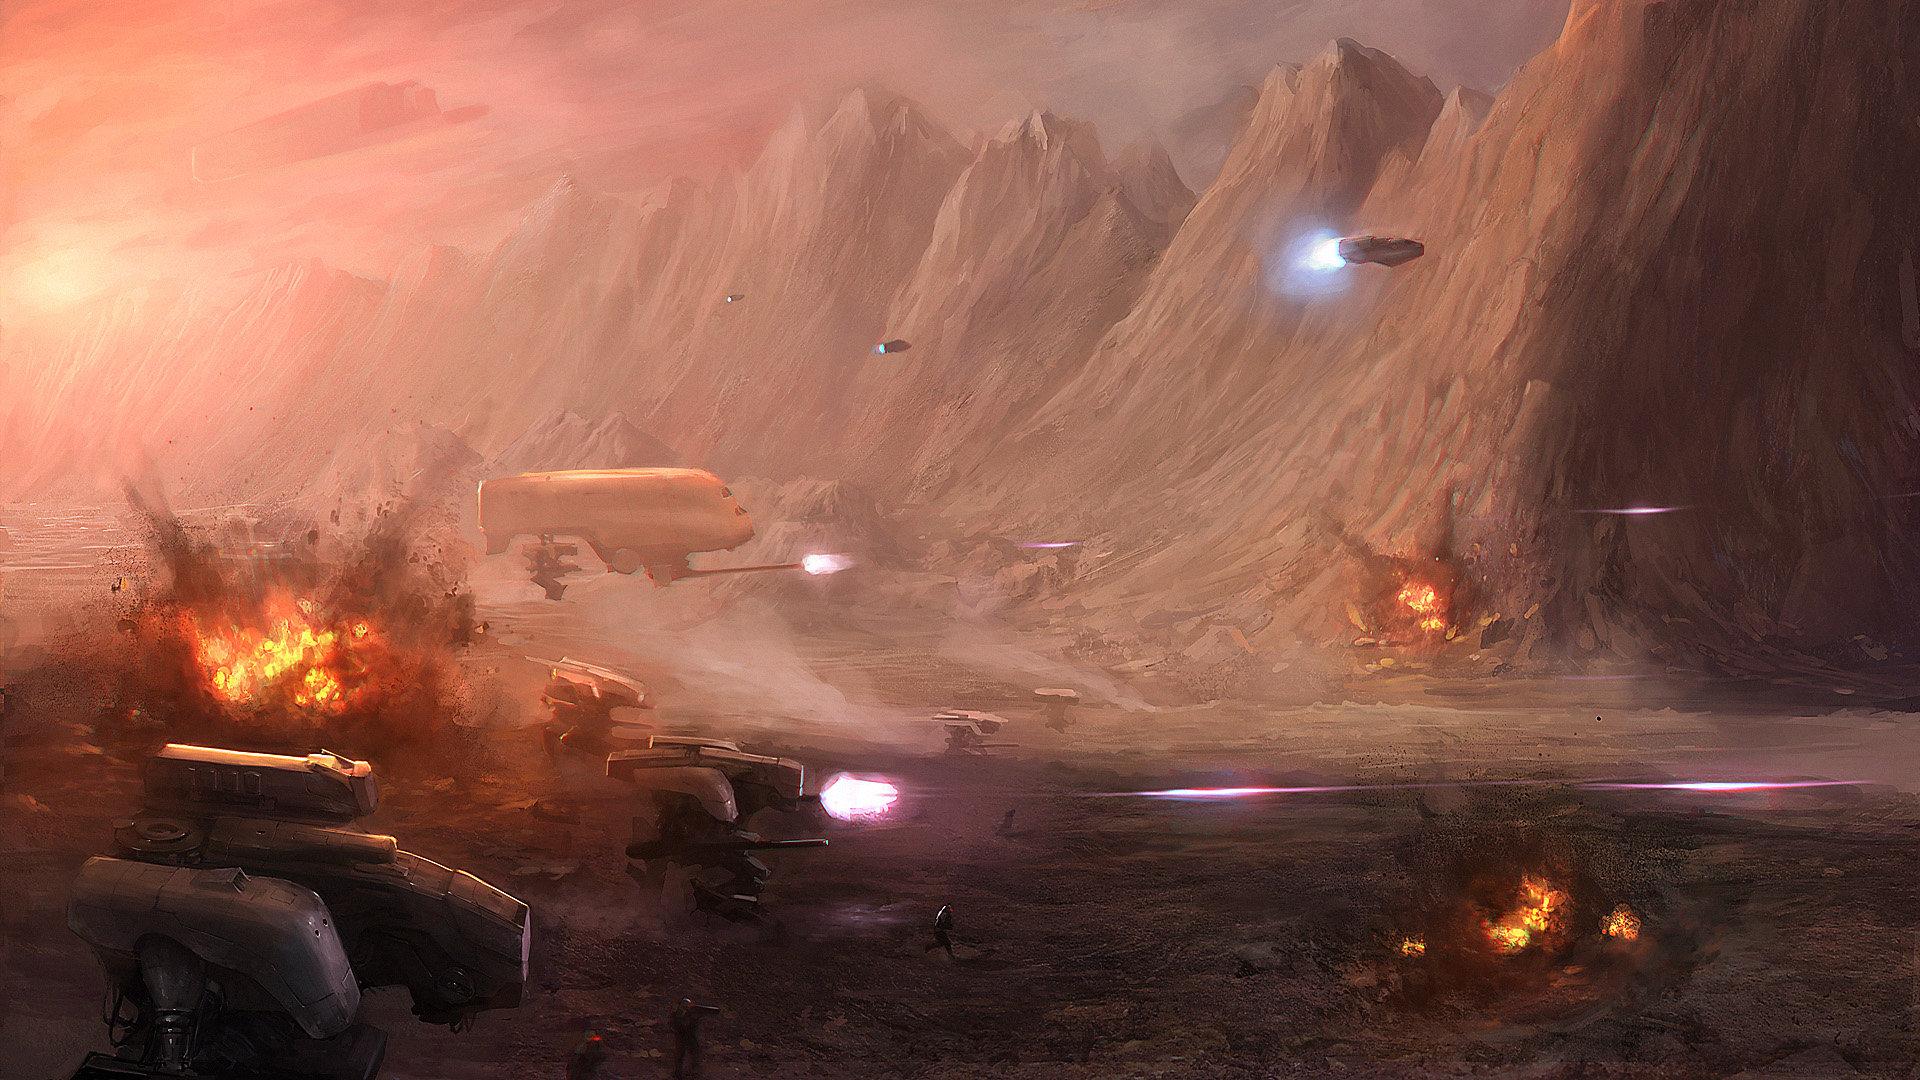 epic space battle wallpaper full hd 1080p 450431